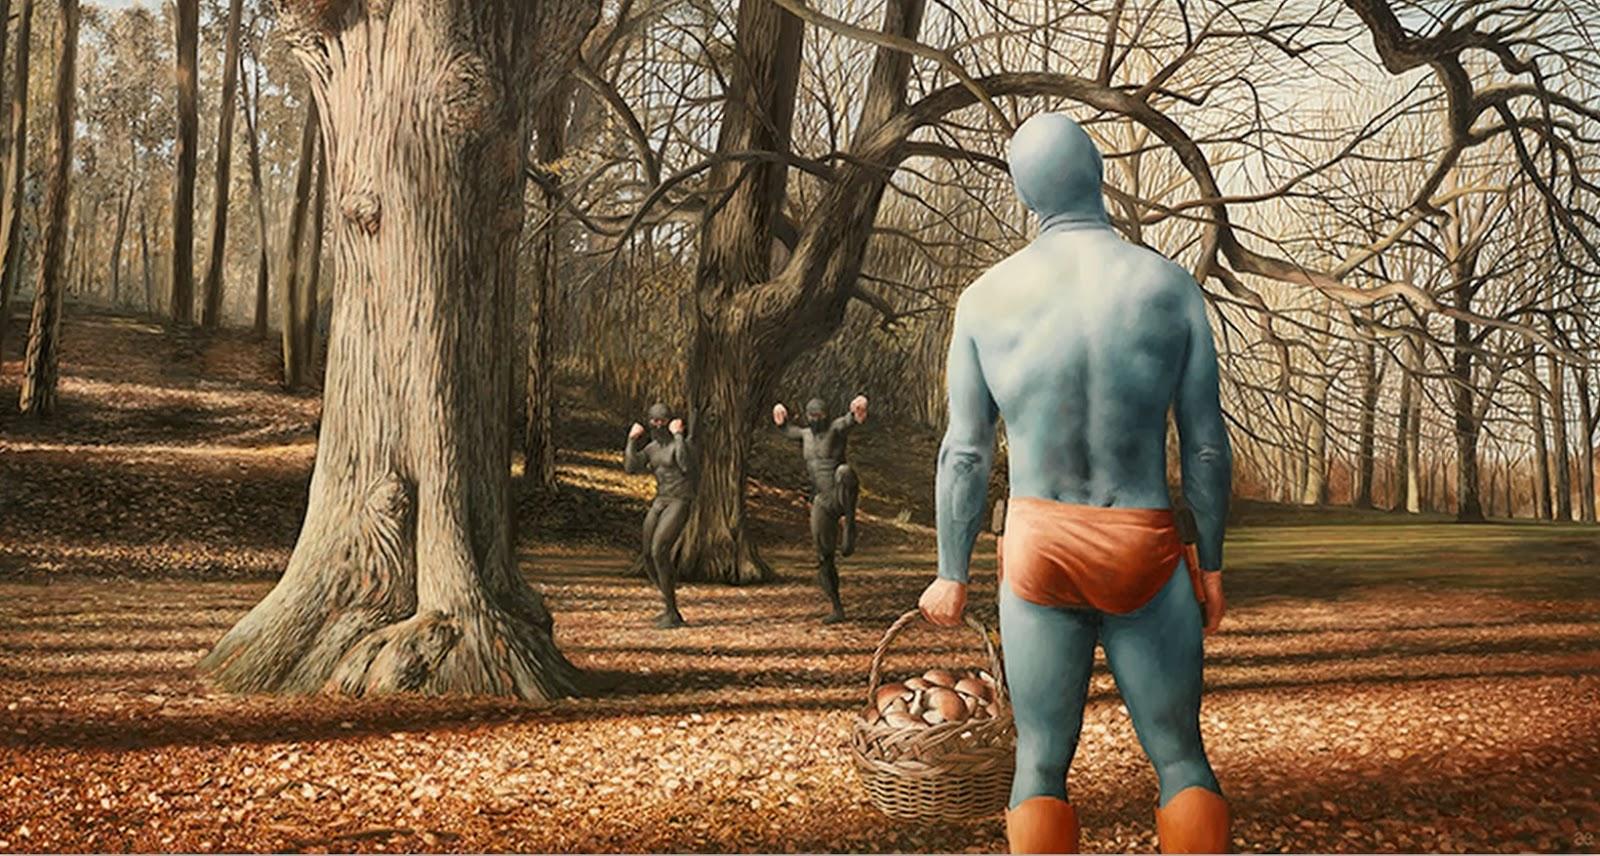 realismo-pinturas